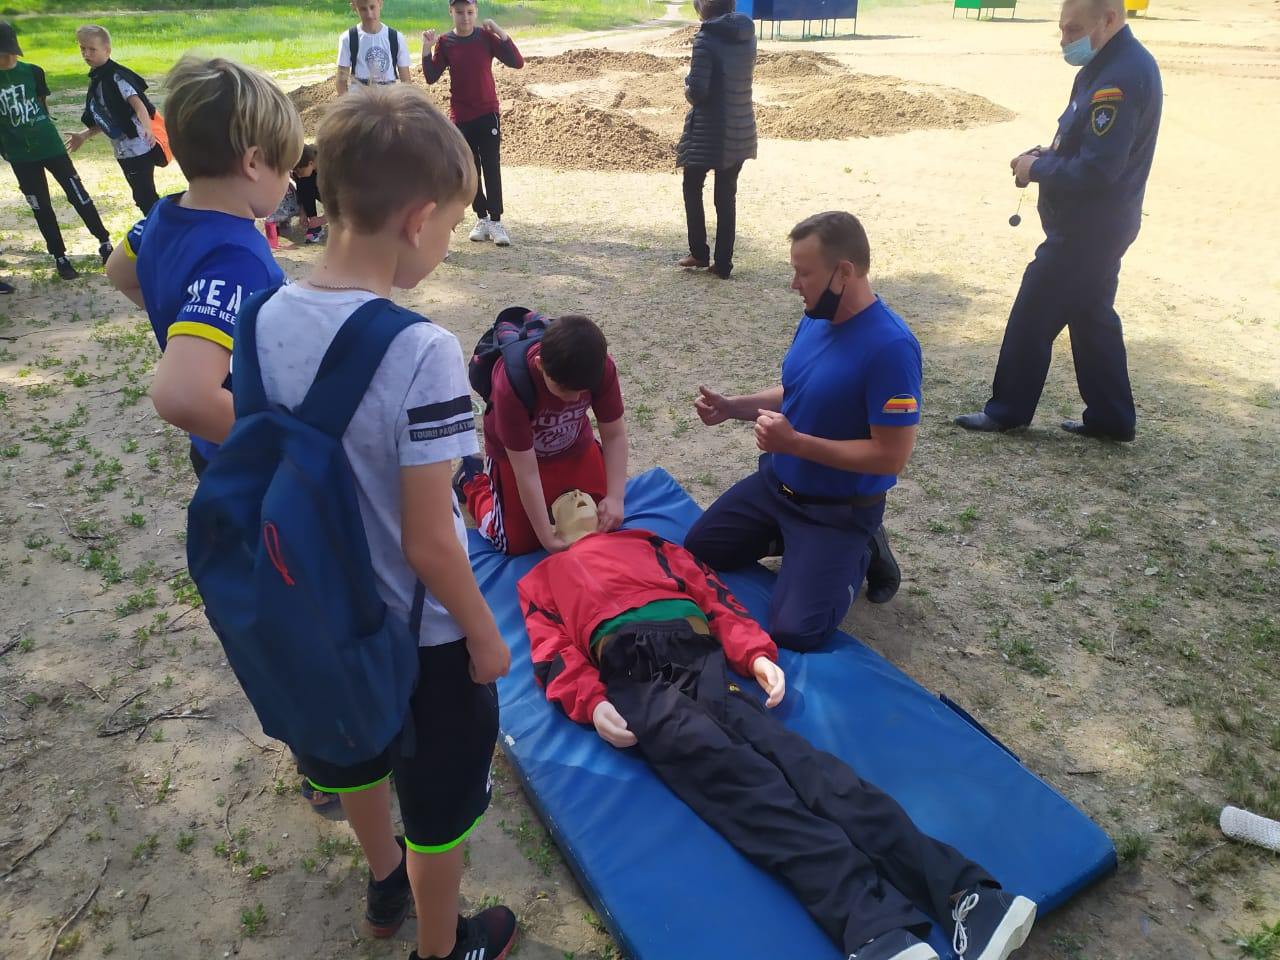 Белокалитвинские спасатели провели учения на воде